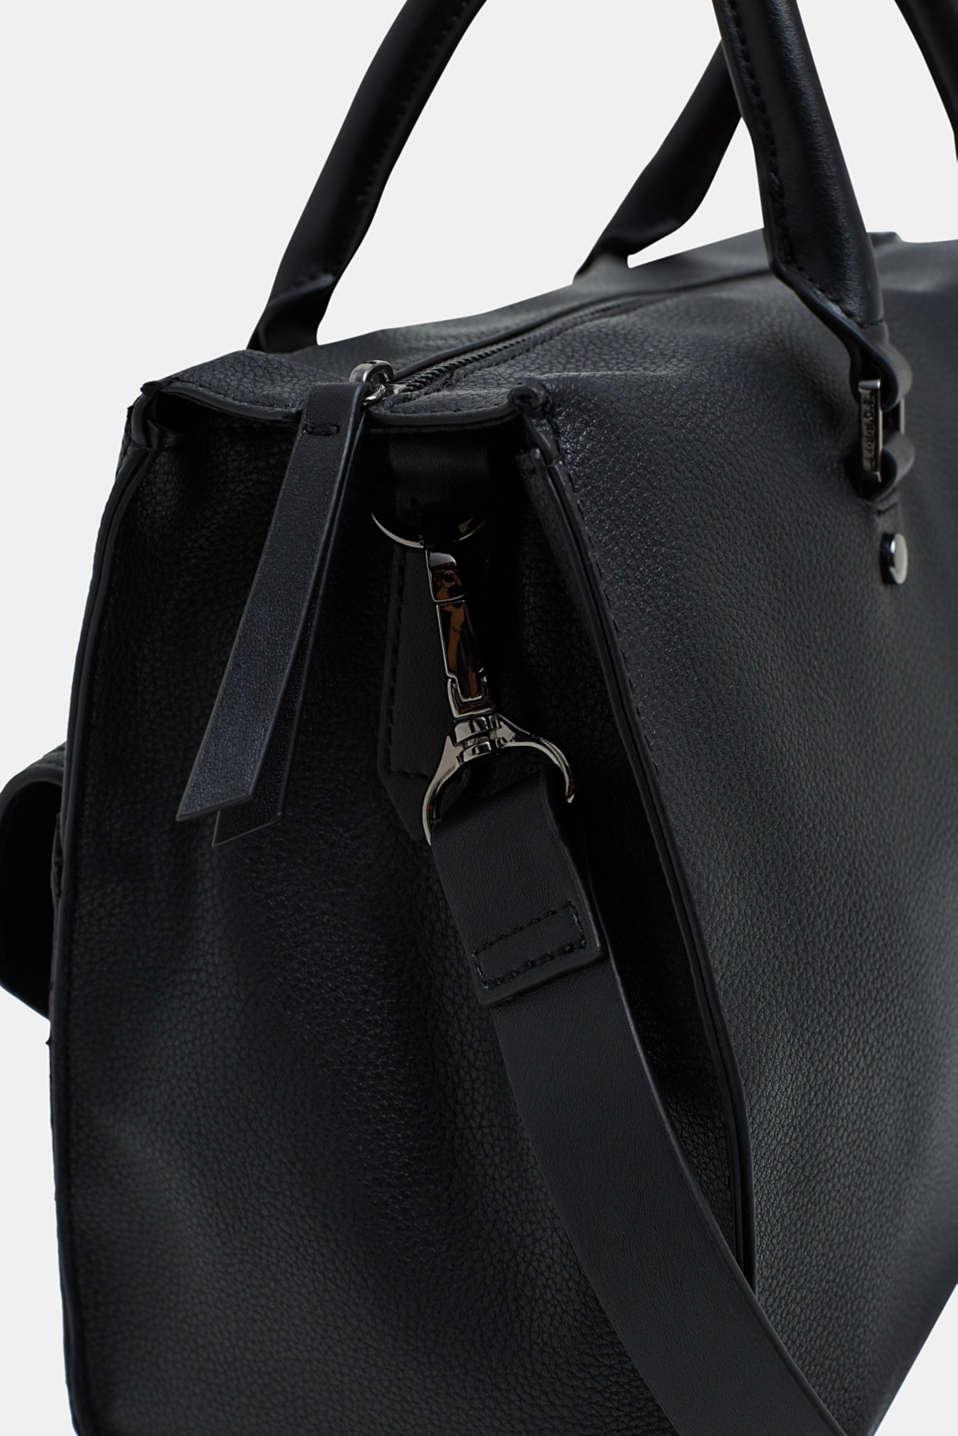 Bags, BLACK, detail image number 3